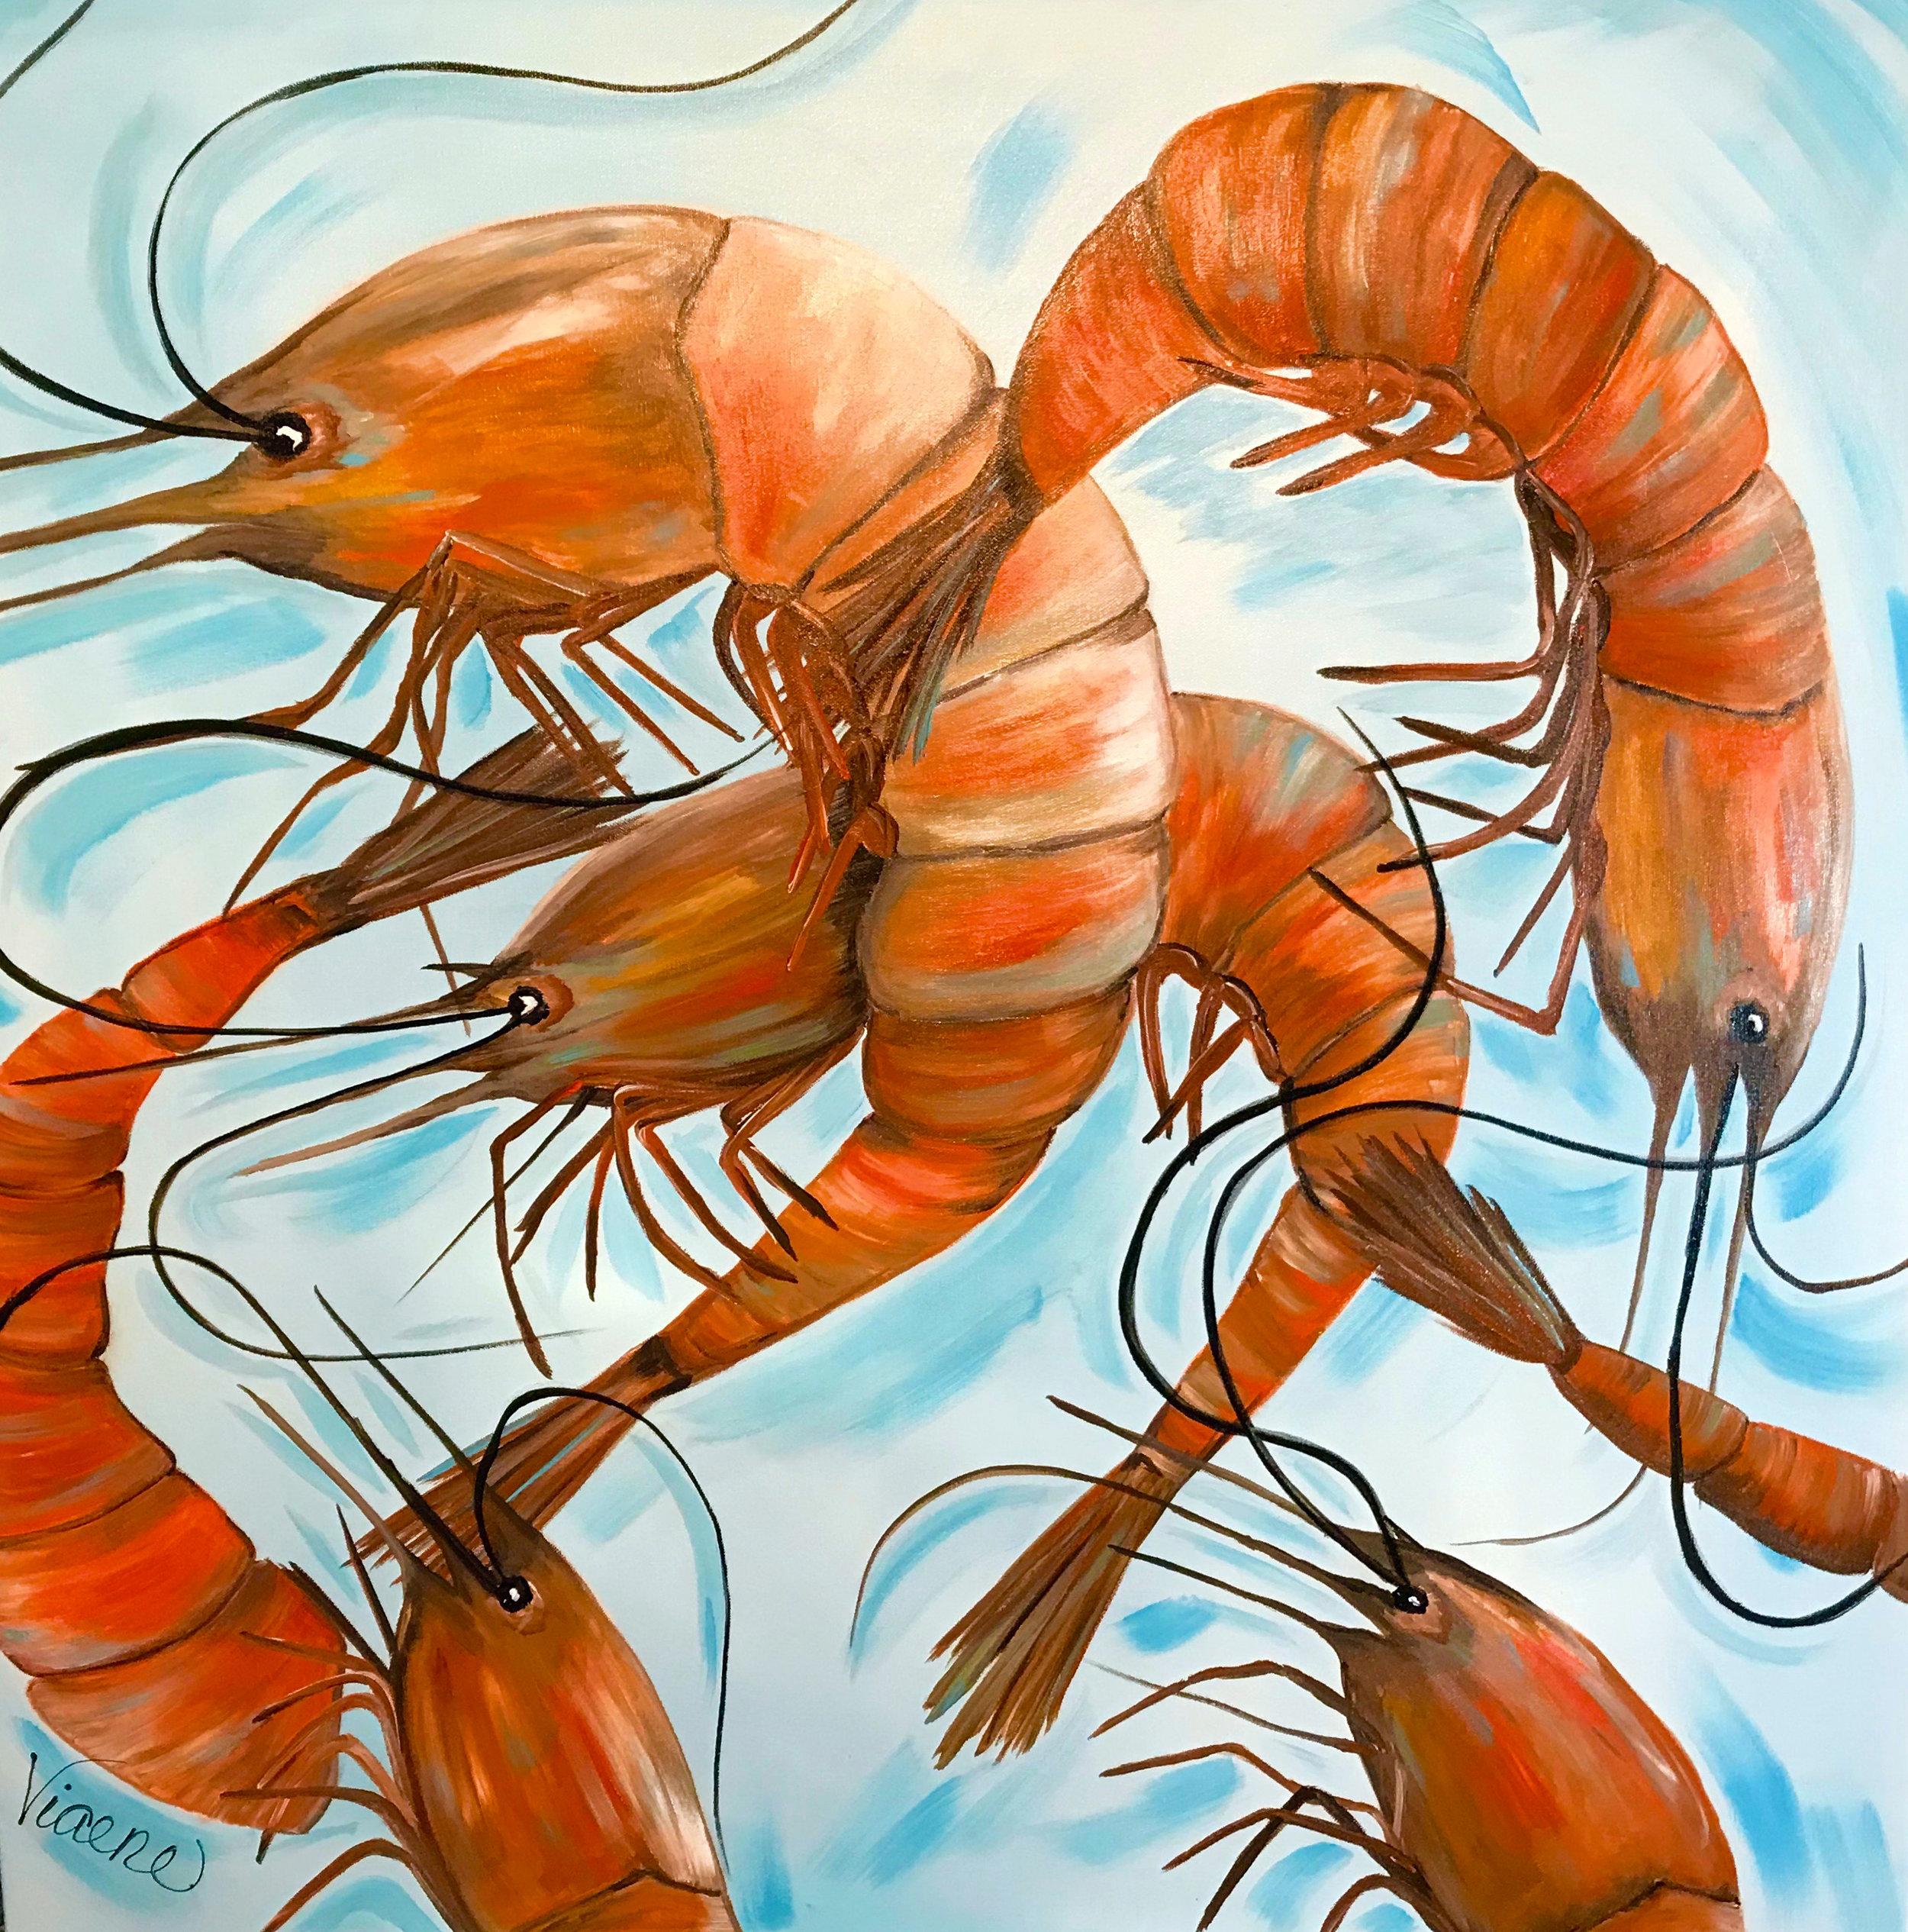 Shrimp, Anyone? - 201840x40 inchesacrylic on gallery-wrapped canvas